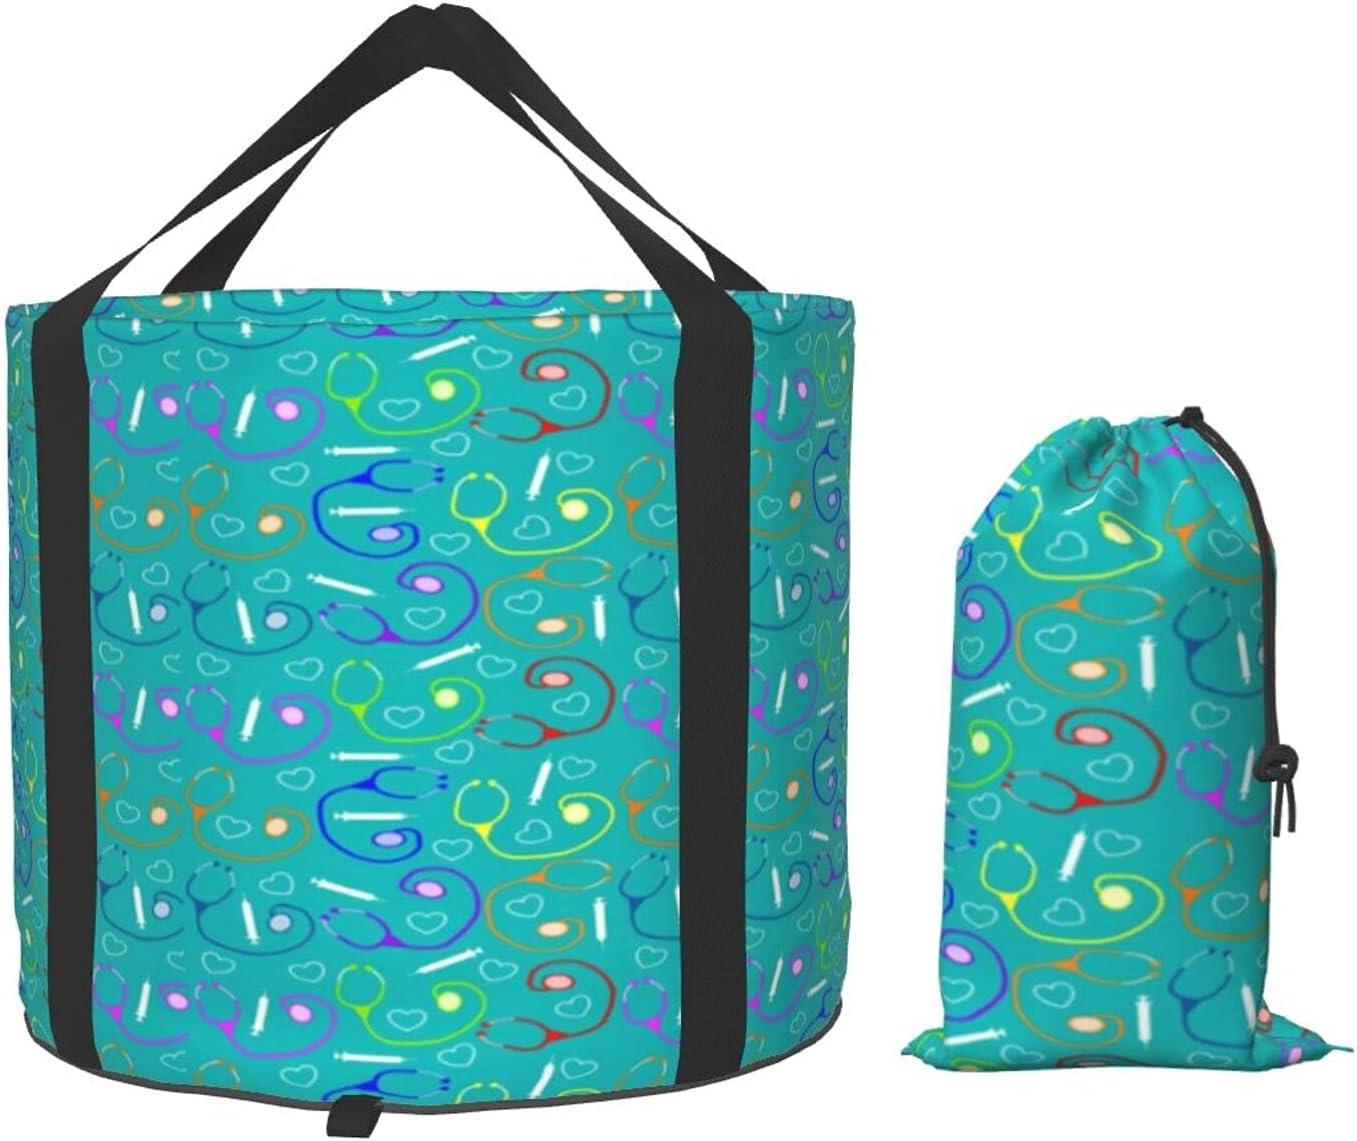 Sujoeuy Very popular Multifunctional Portable Travel Wash Foldi Outdoor Las Vegas Mall Basin